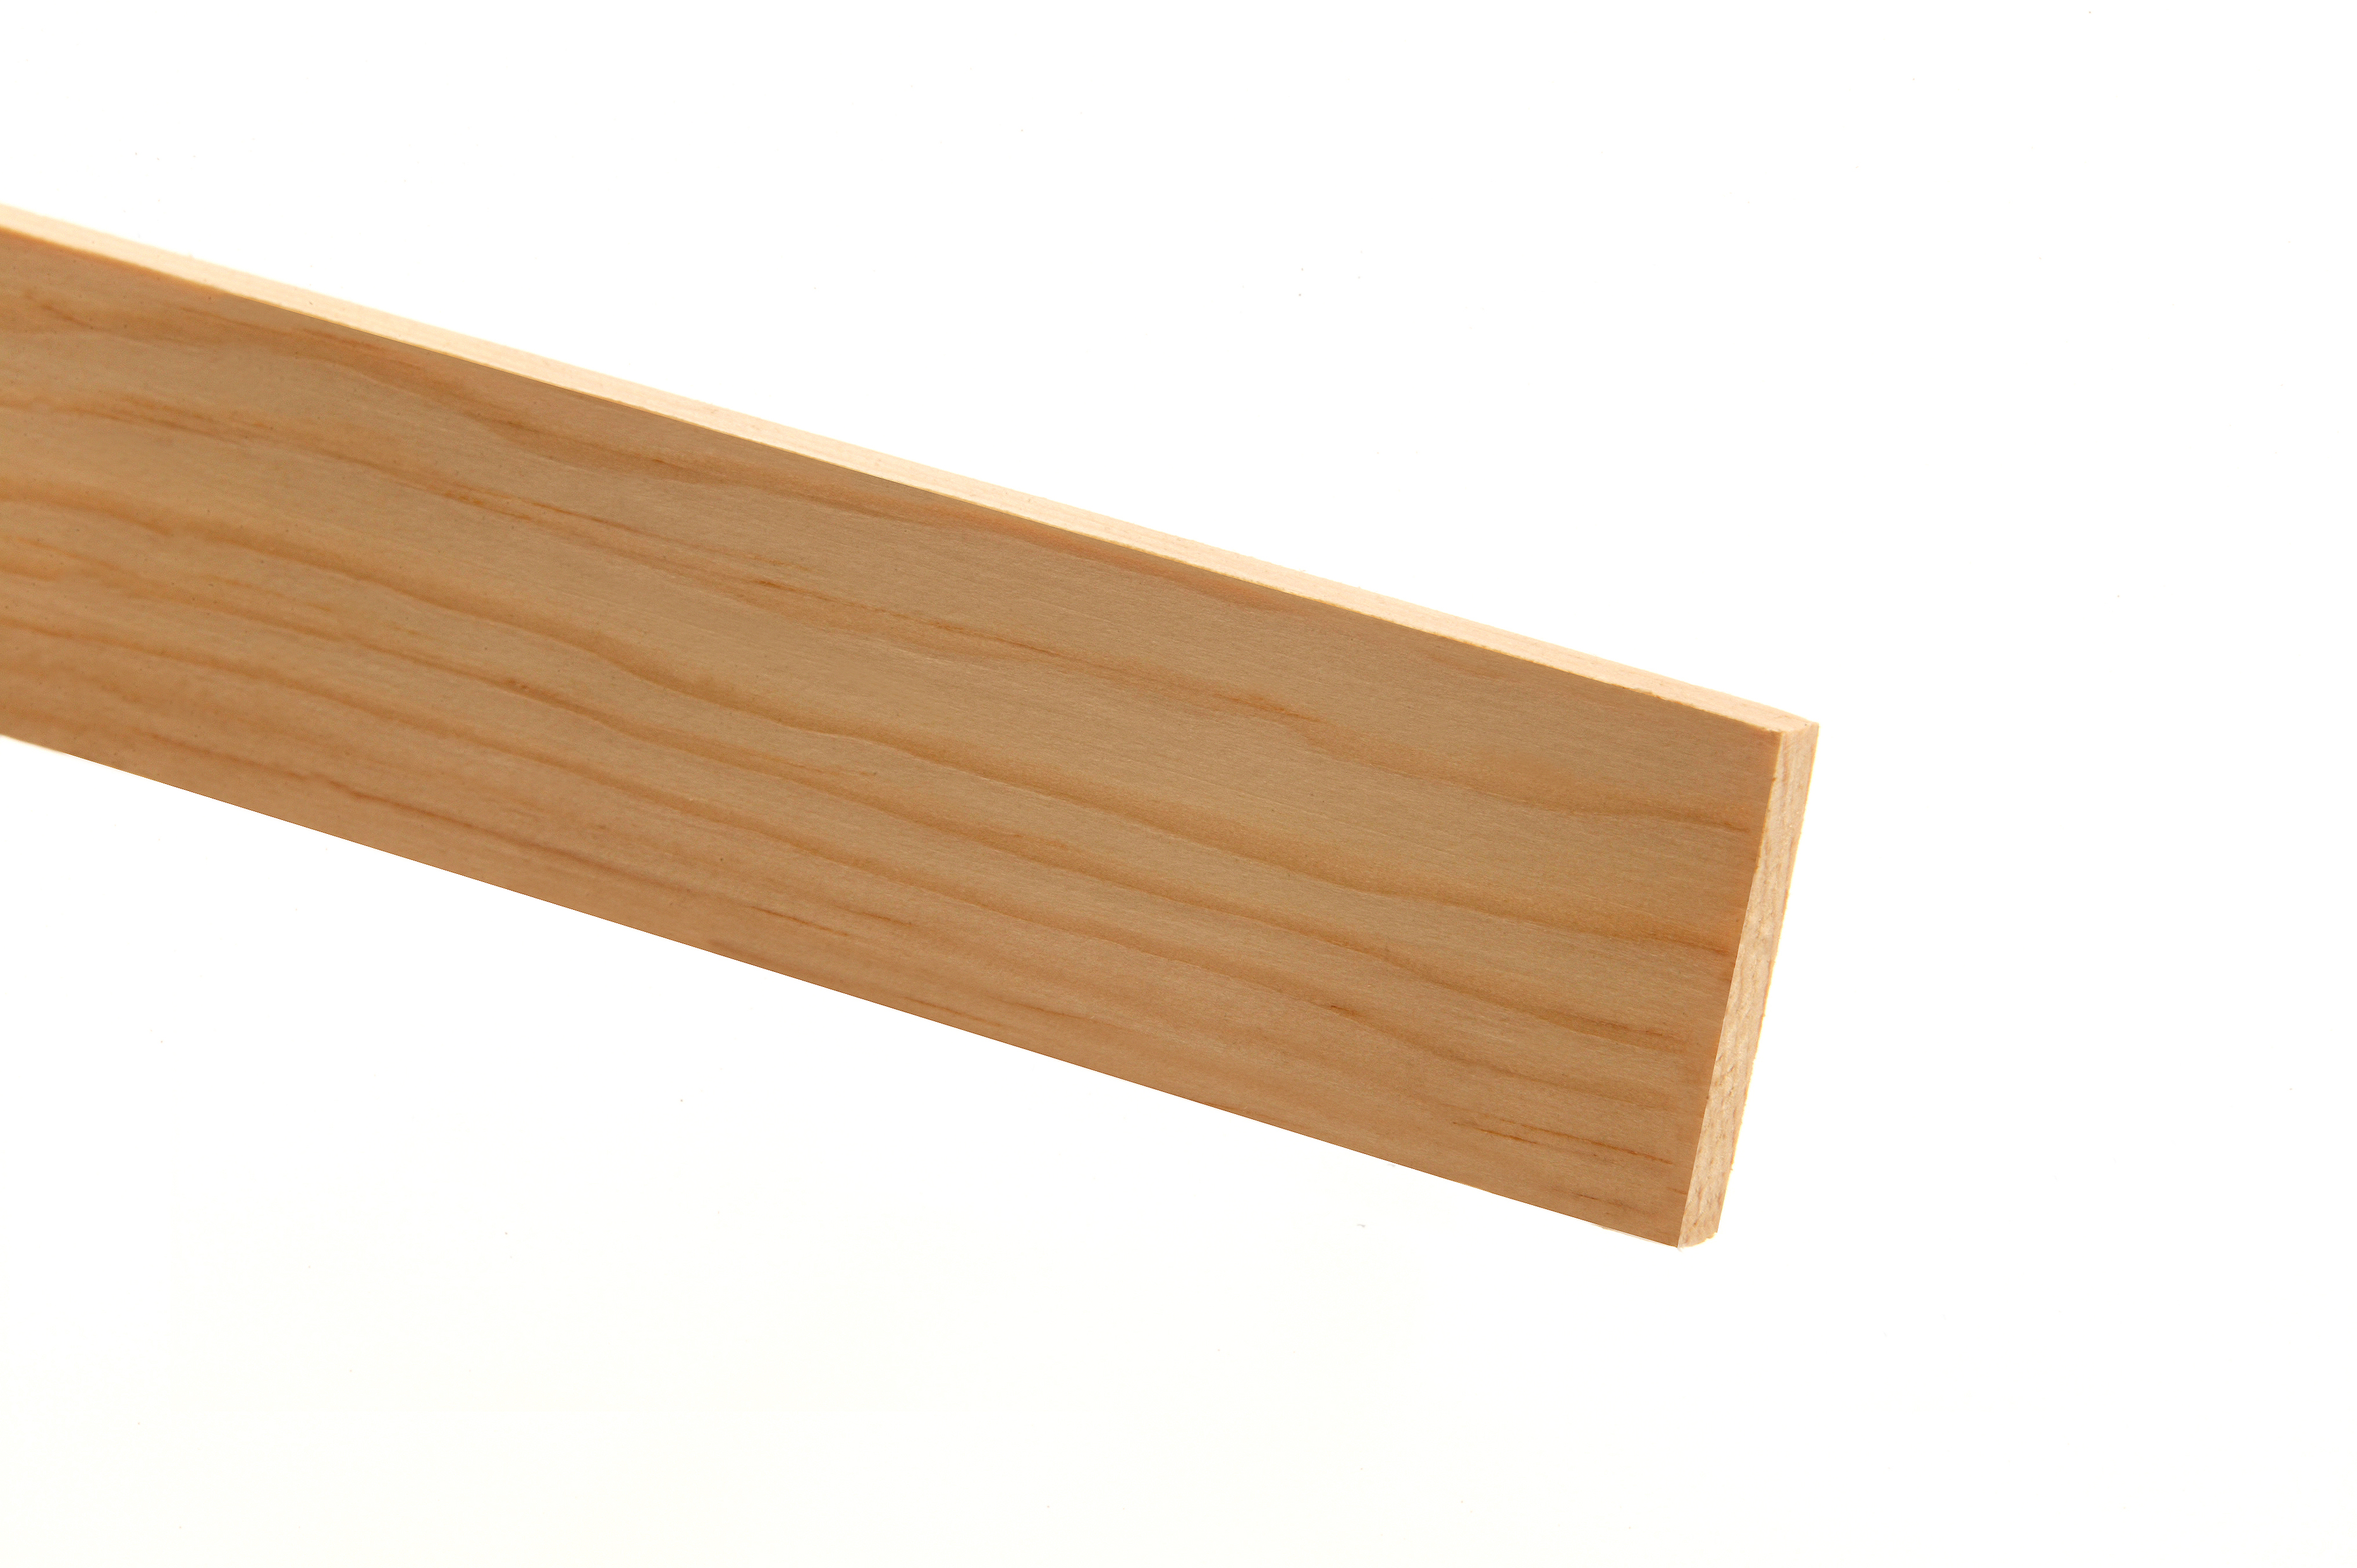 5 Pine PSE Stripwood 34 x 71 x 2400mm